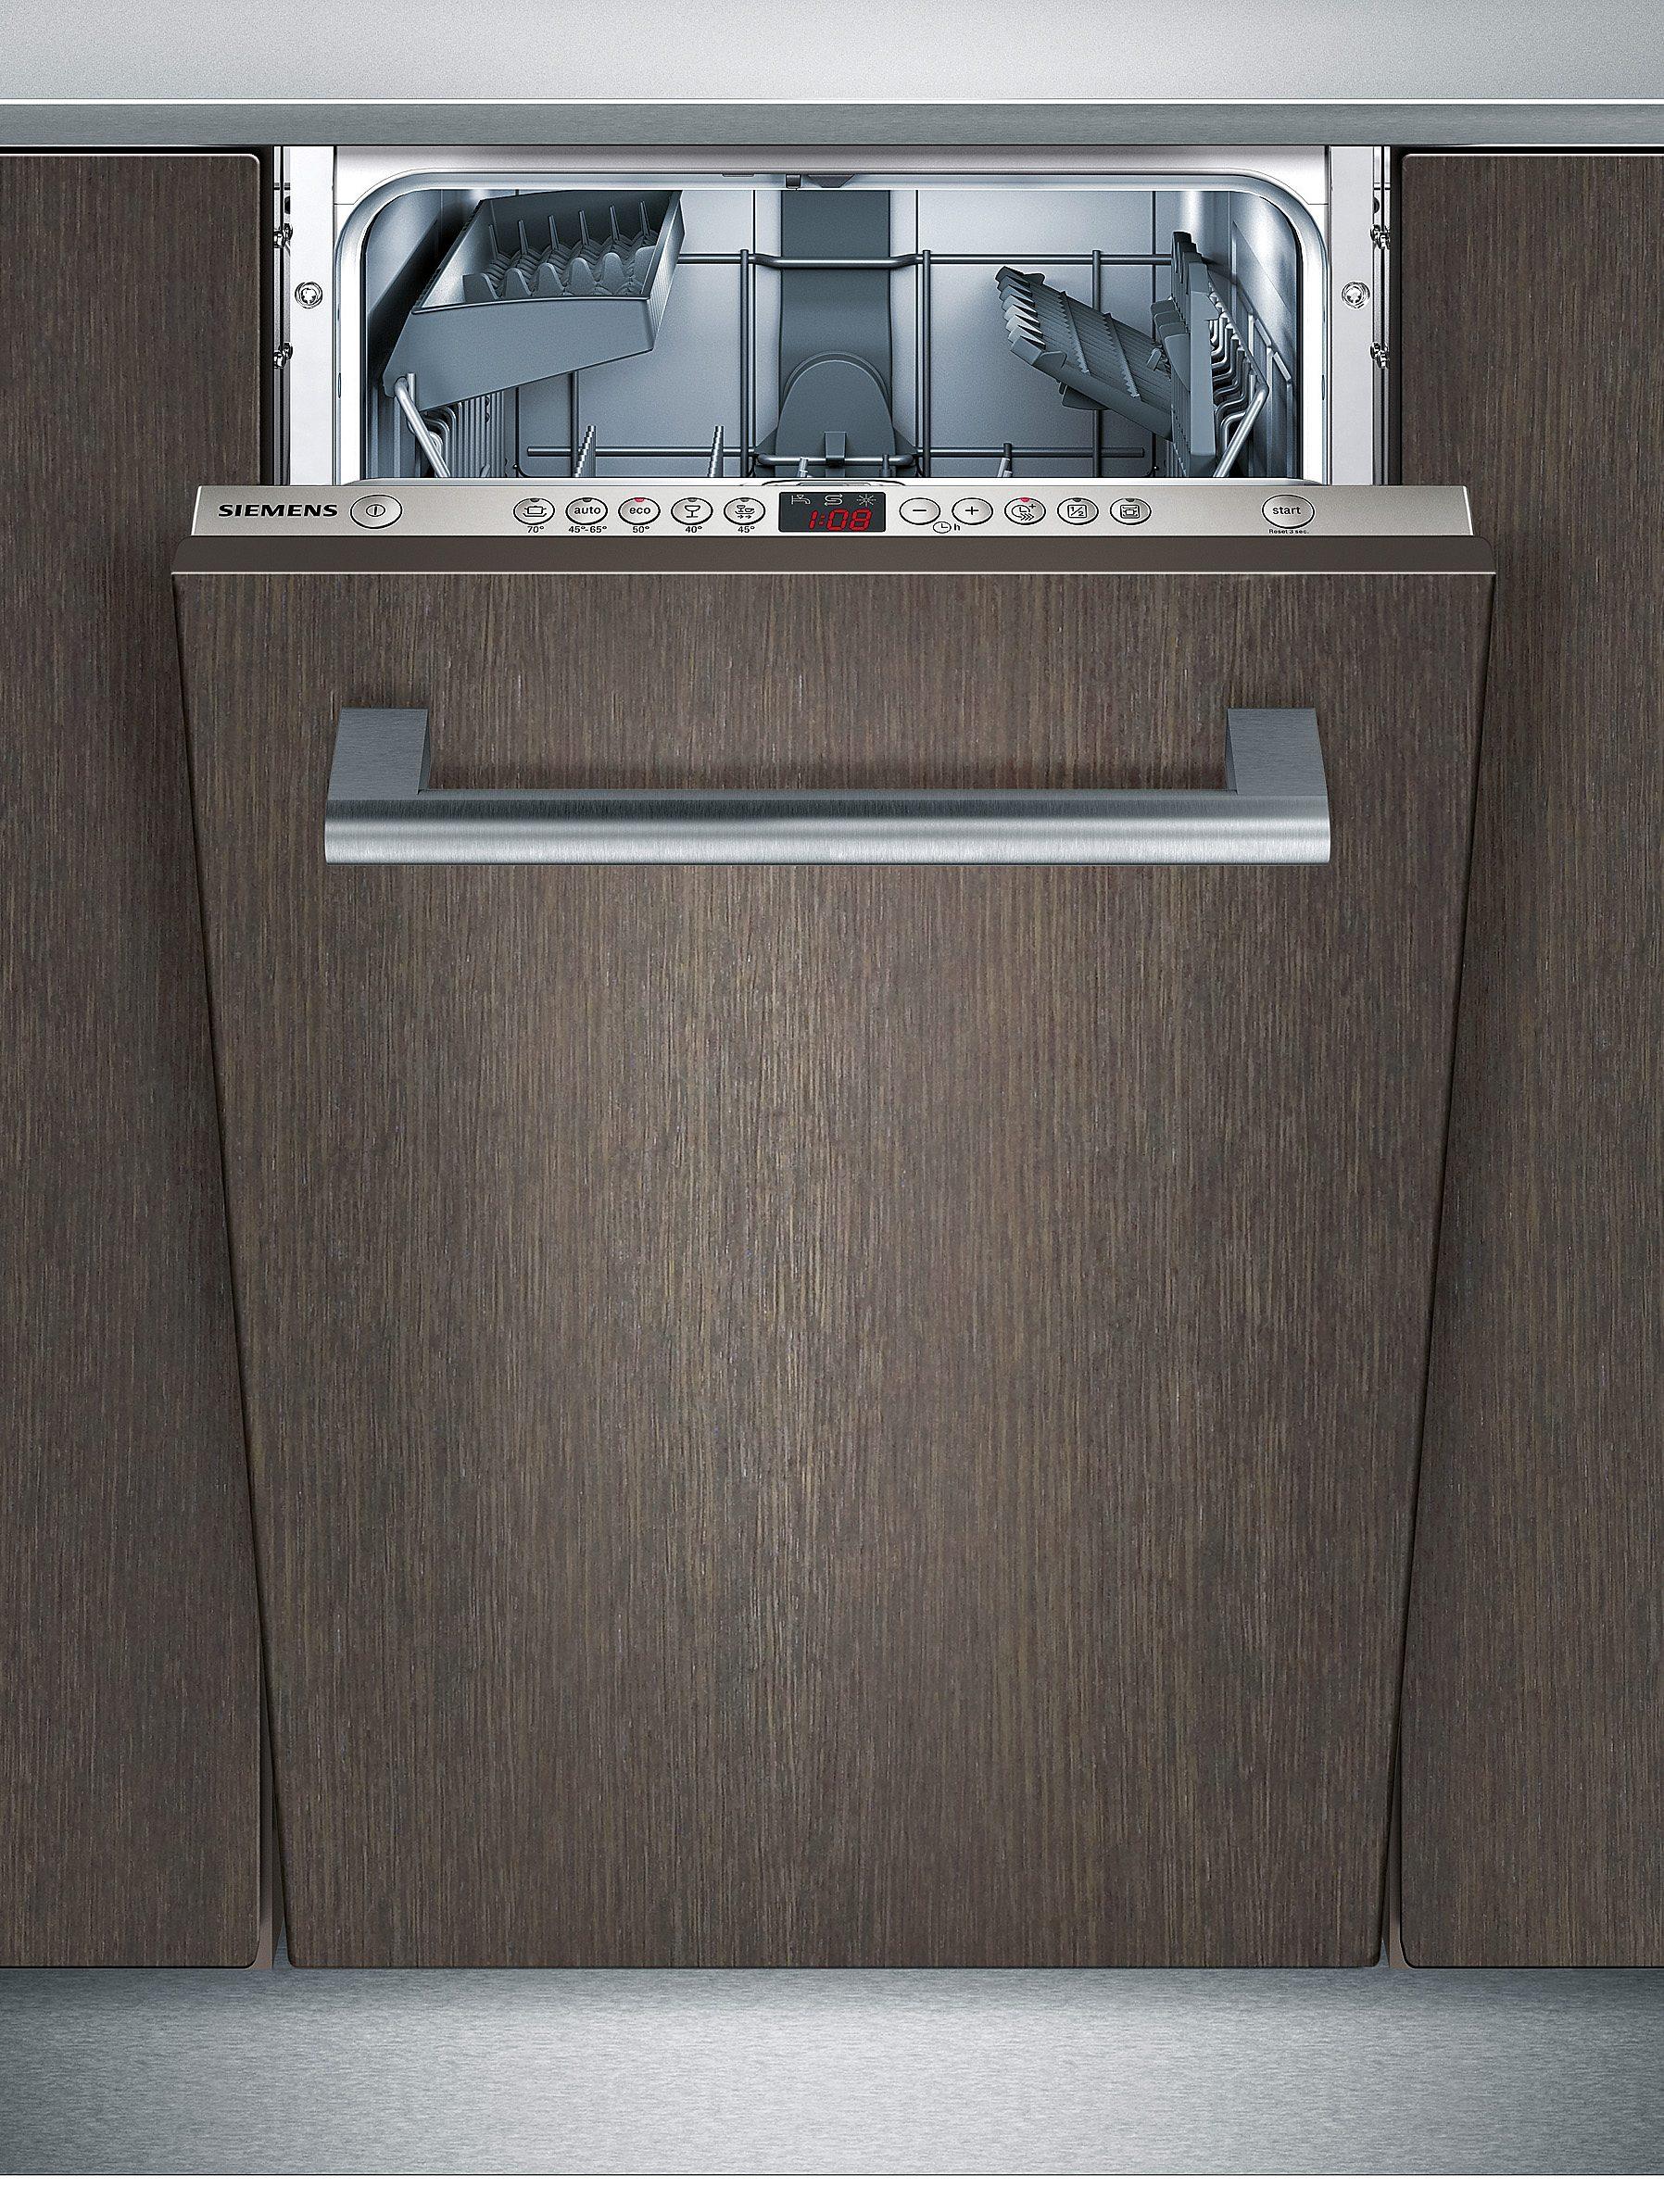 Siemens vollintegrierbarer Einbau-Geschirrspüler SR65M036EU, Energieklasse A+, 8,5 Liter